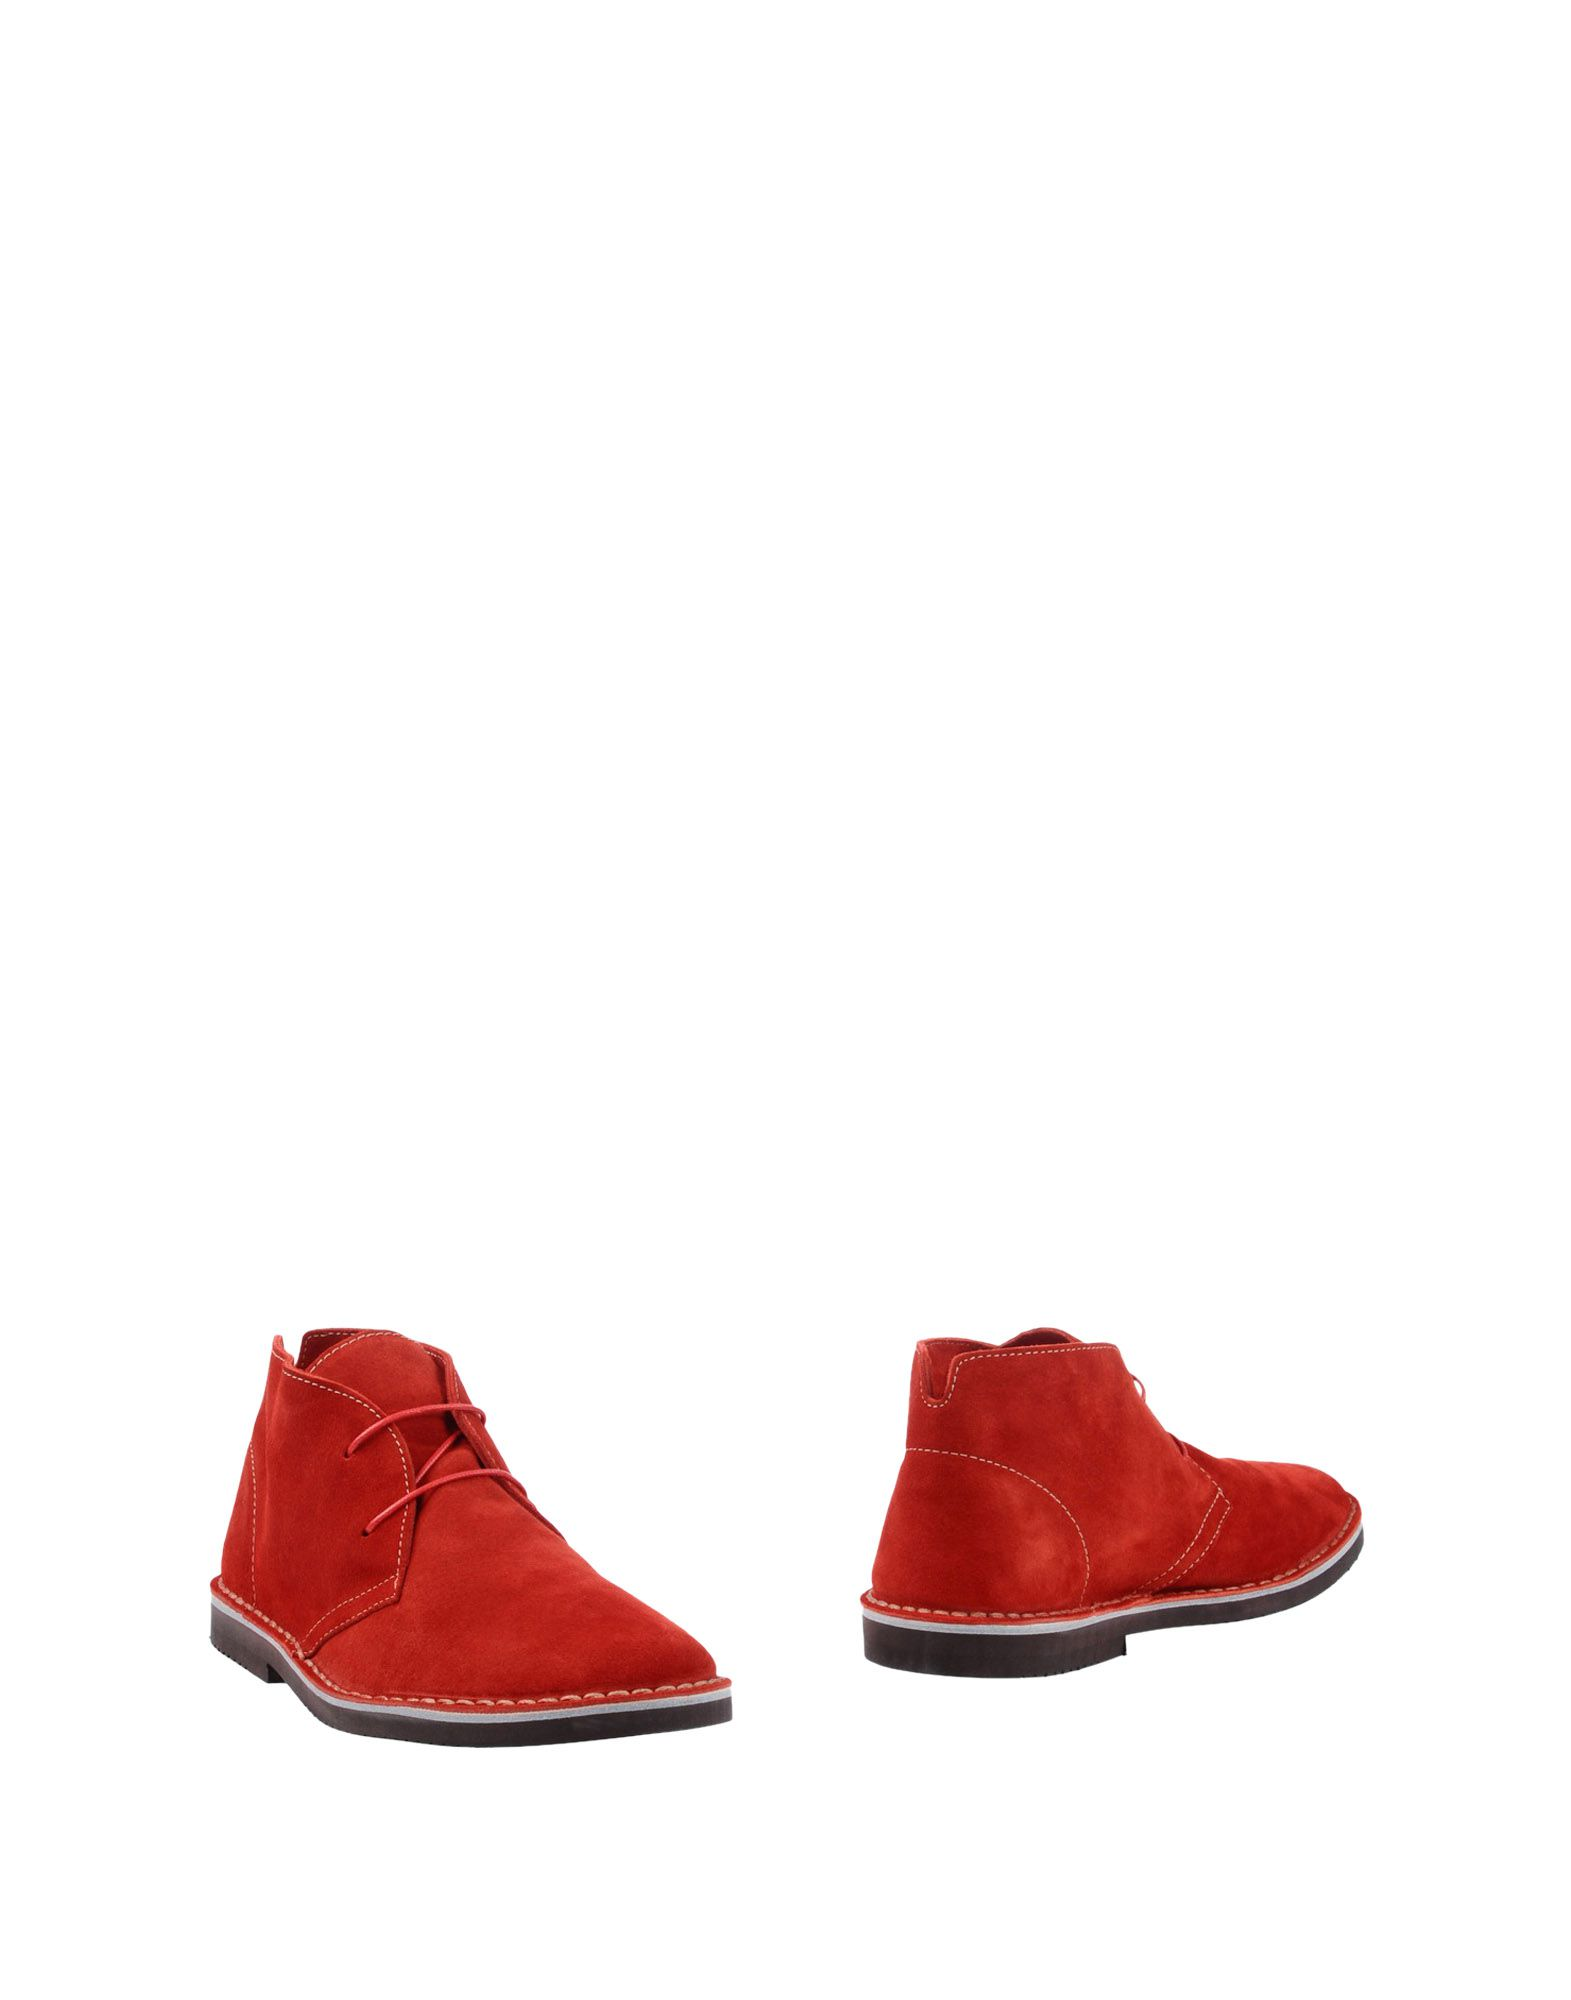 Bottine Lerews Homme - Bottines Lerews  Rouge Mode pas cher et belle